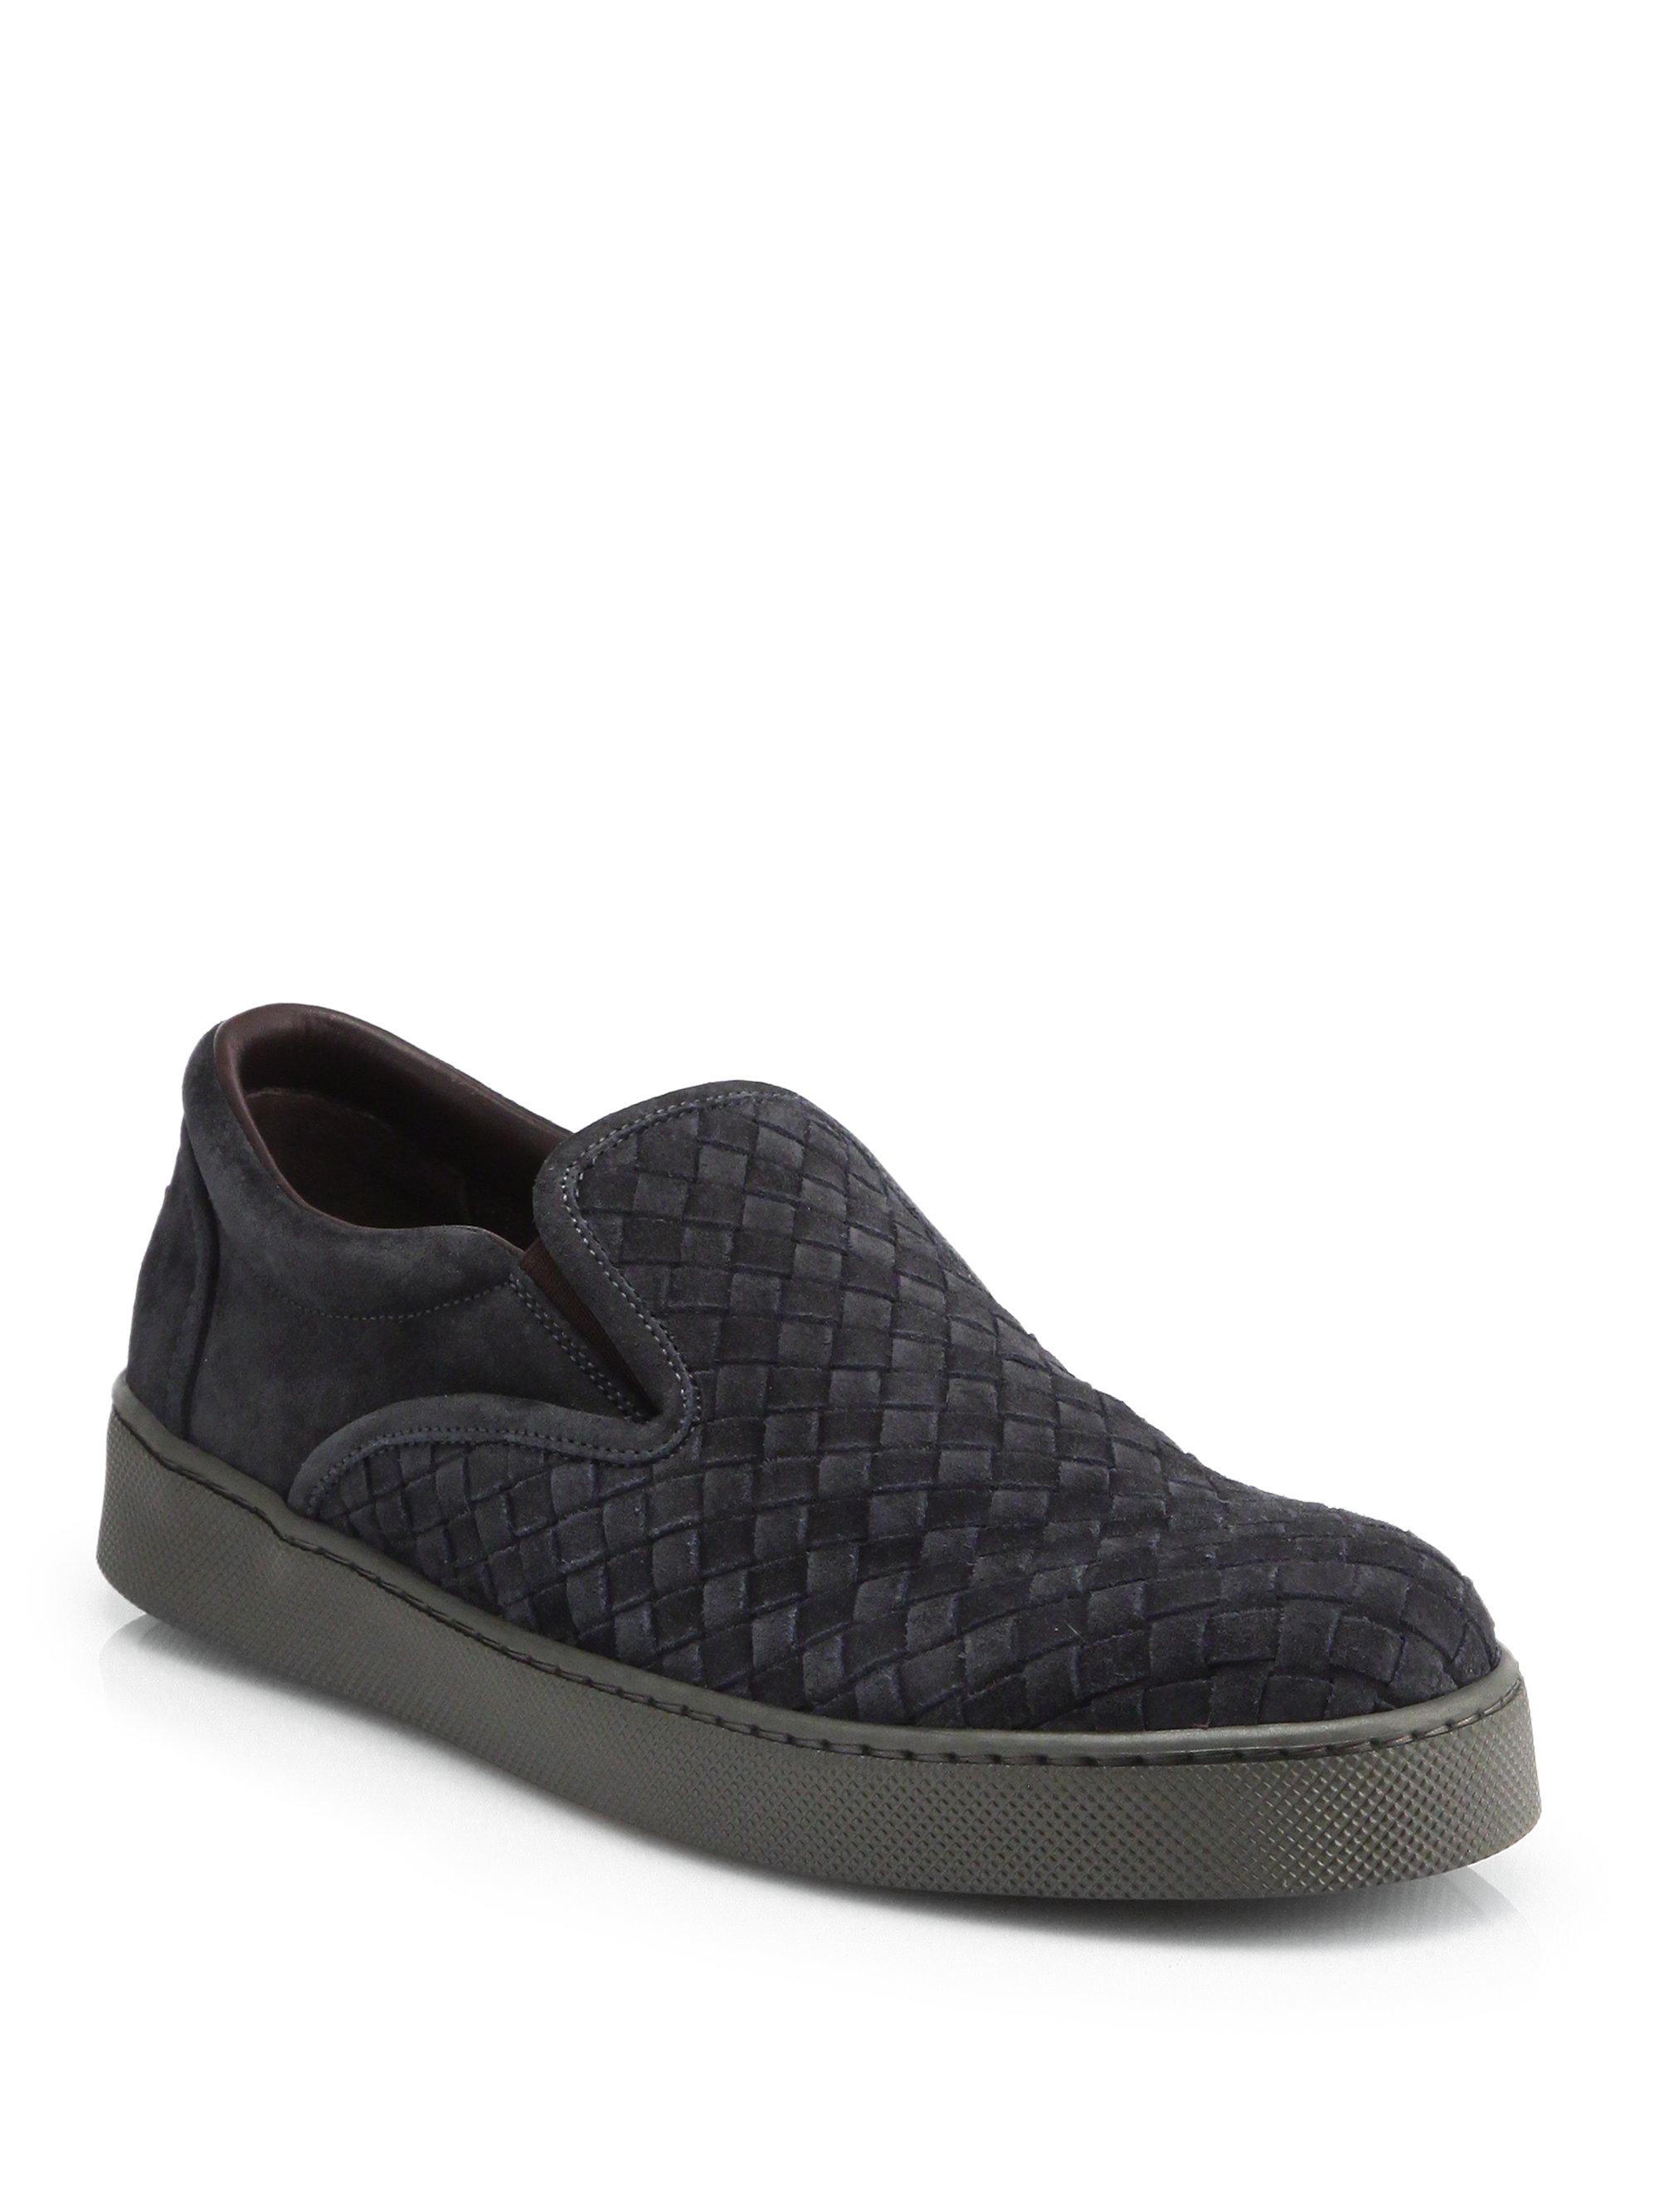 Bottega Veneta Black Classic Intrecciato Sneakers NtBDvyoE1